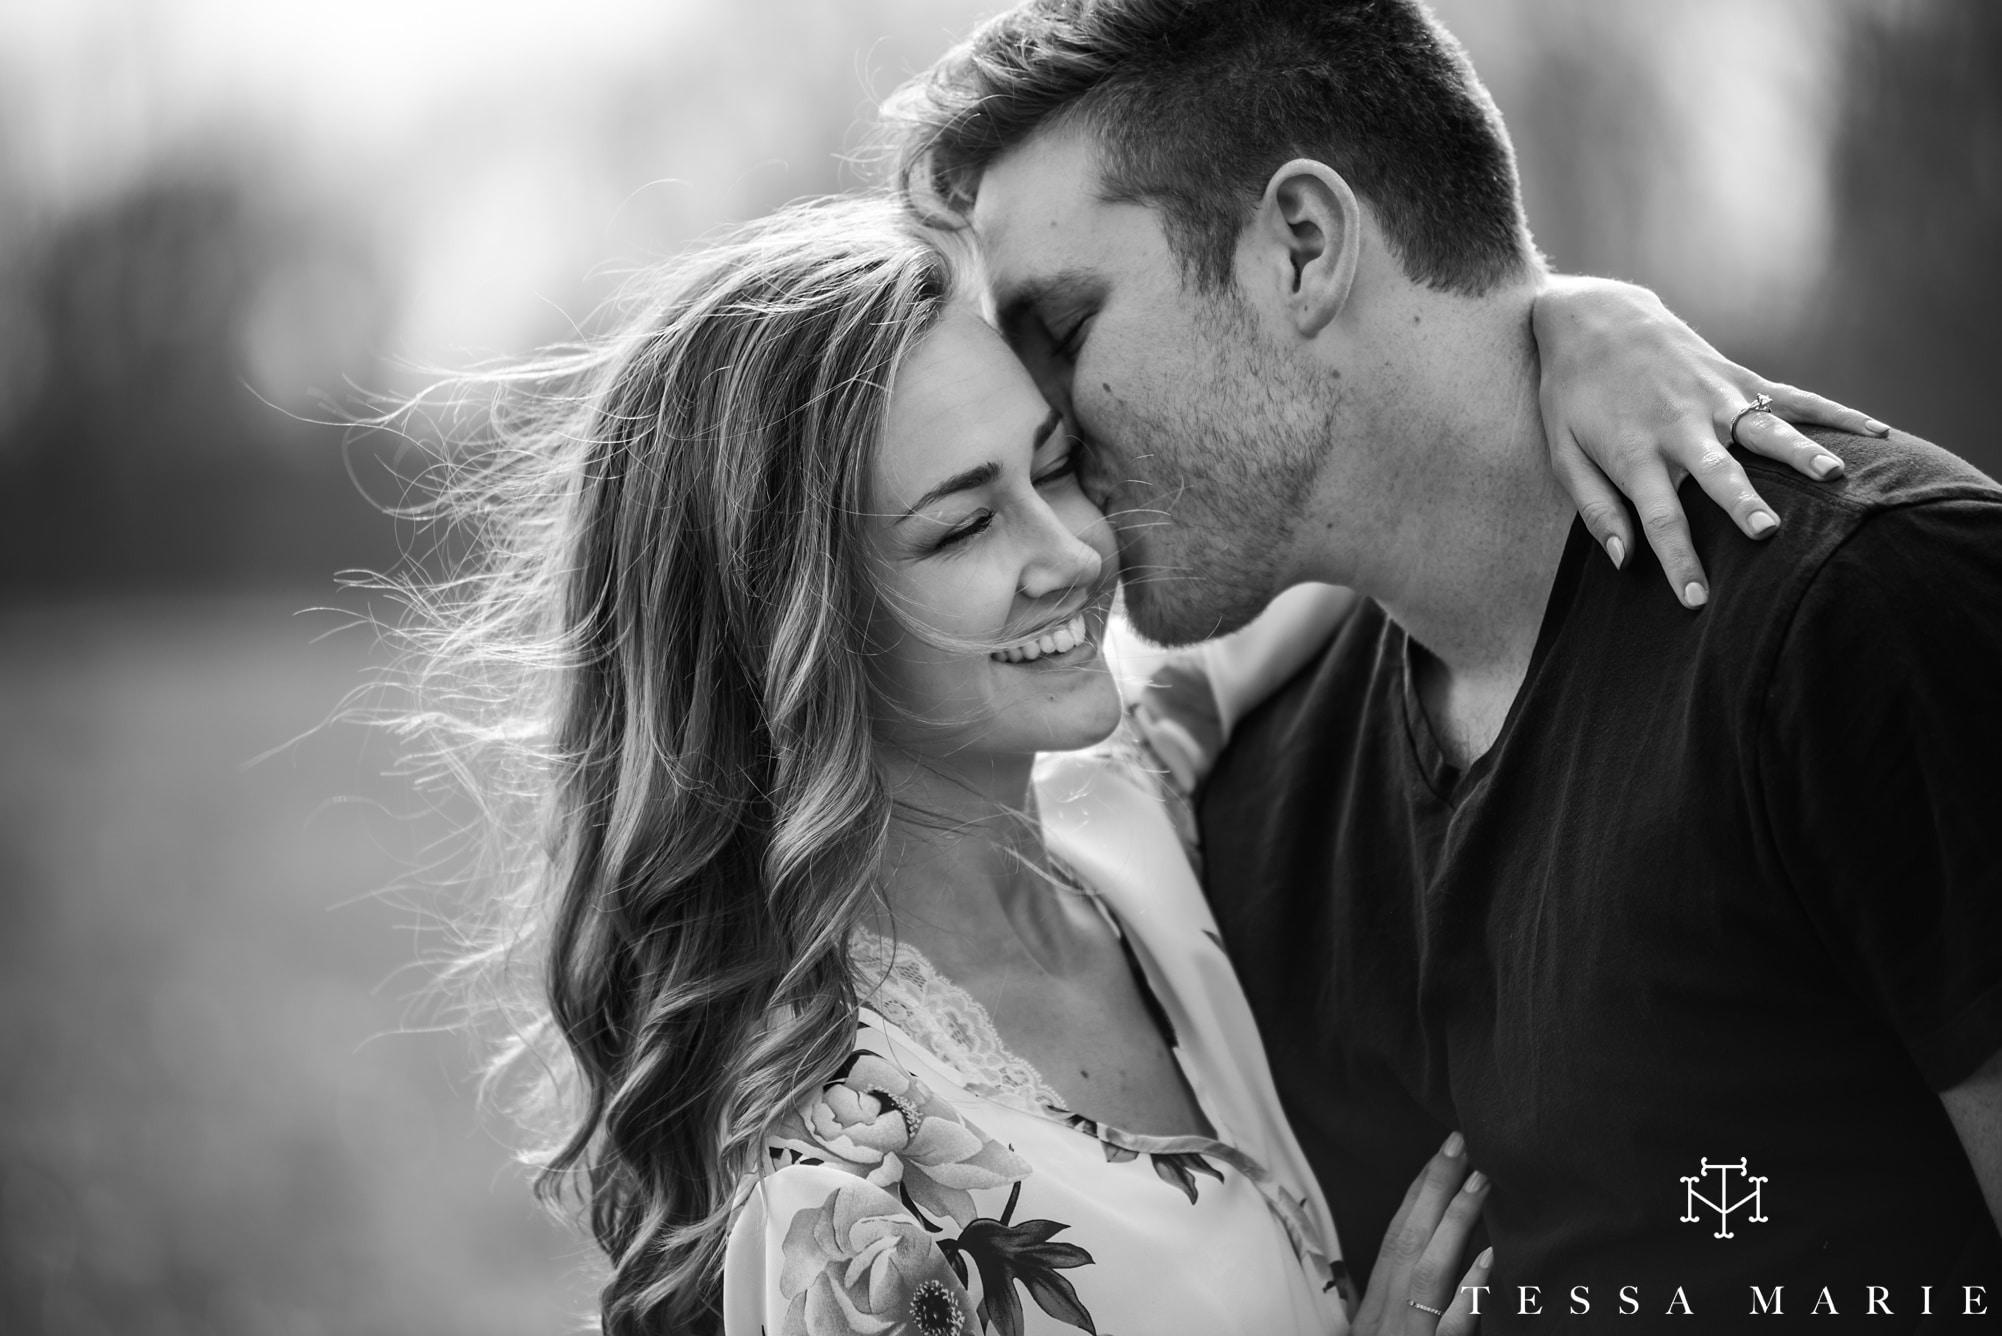 tessa_marie_studios_tessa_marie_weddings_proposal_atlanta_engagement_pictures_0055